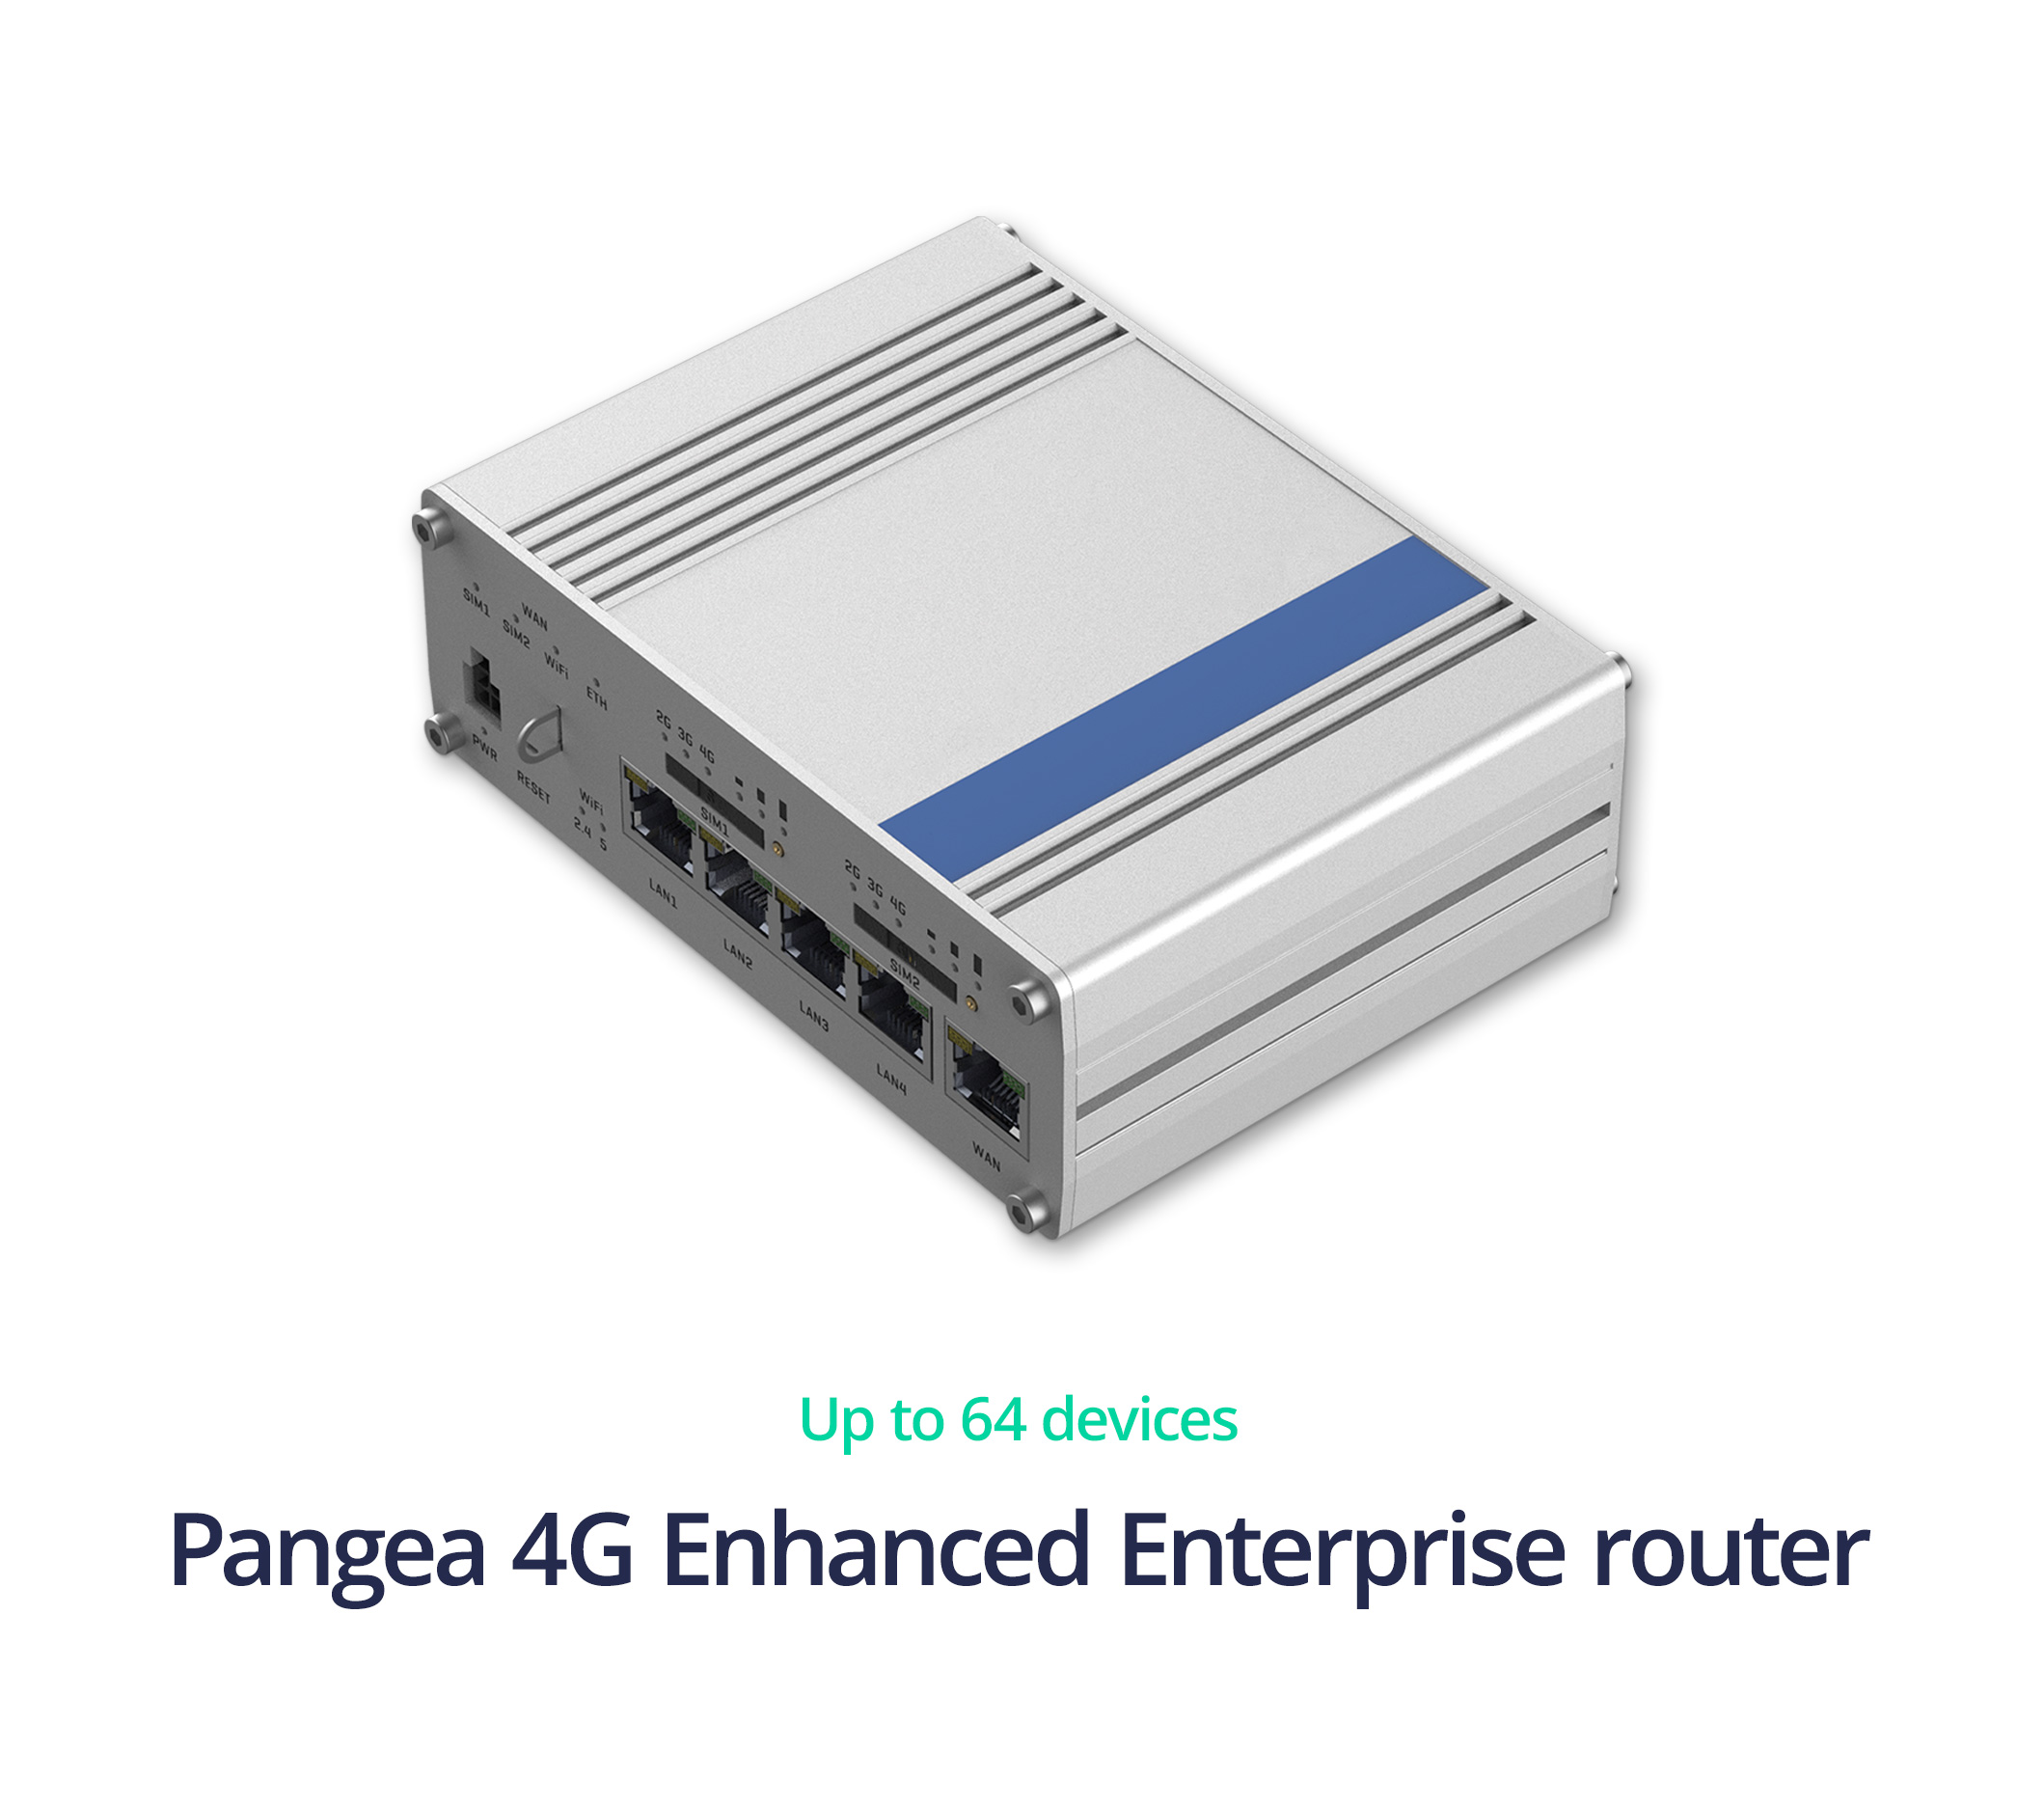 Pangea 4G Enterprise router - Pangea 4G Enhanced Enterprise link